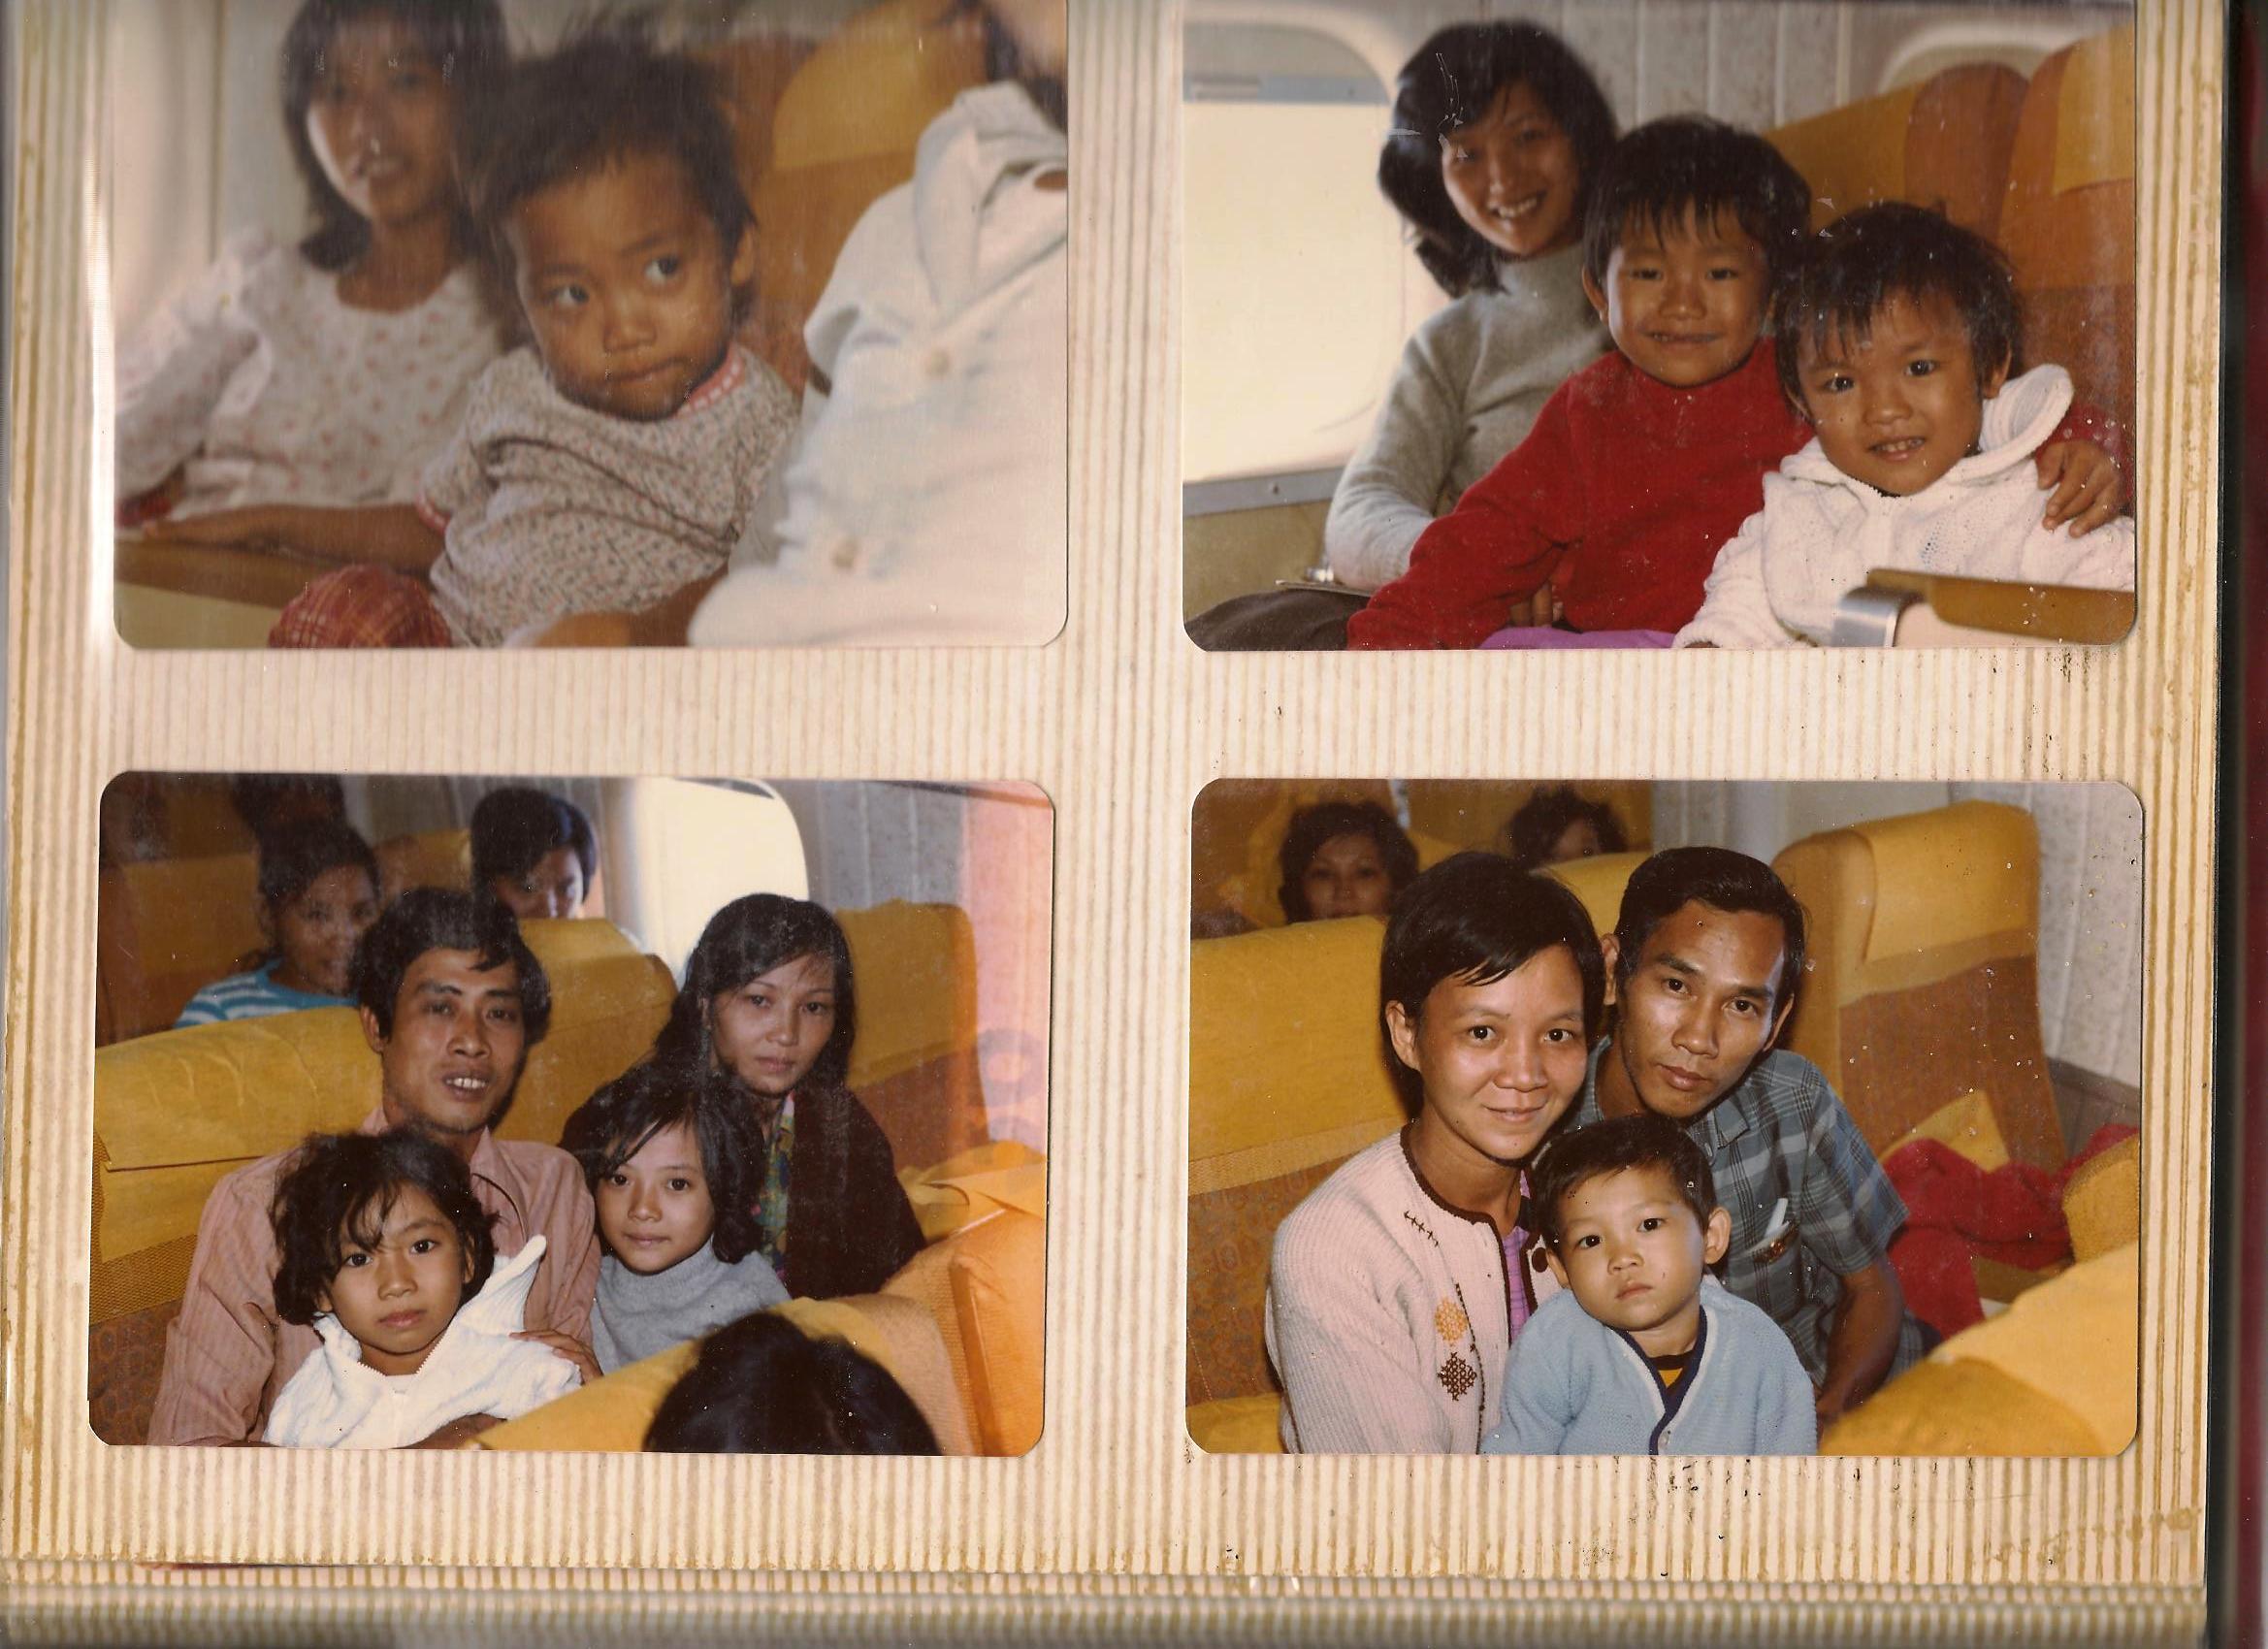 1979_Air Canada_Kuala Lumpur_Families1.jpg